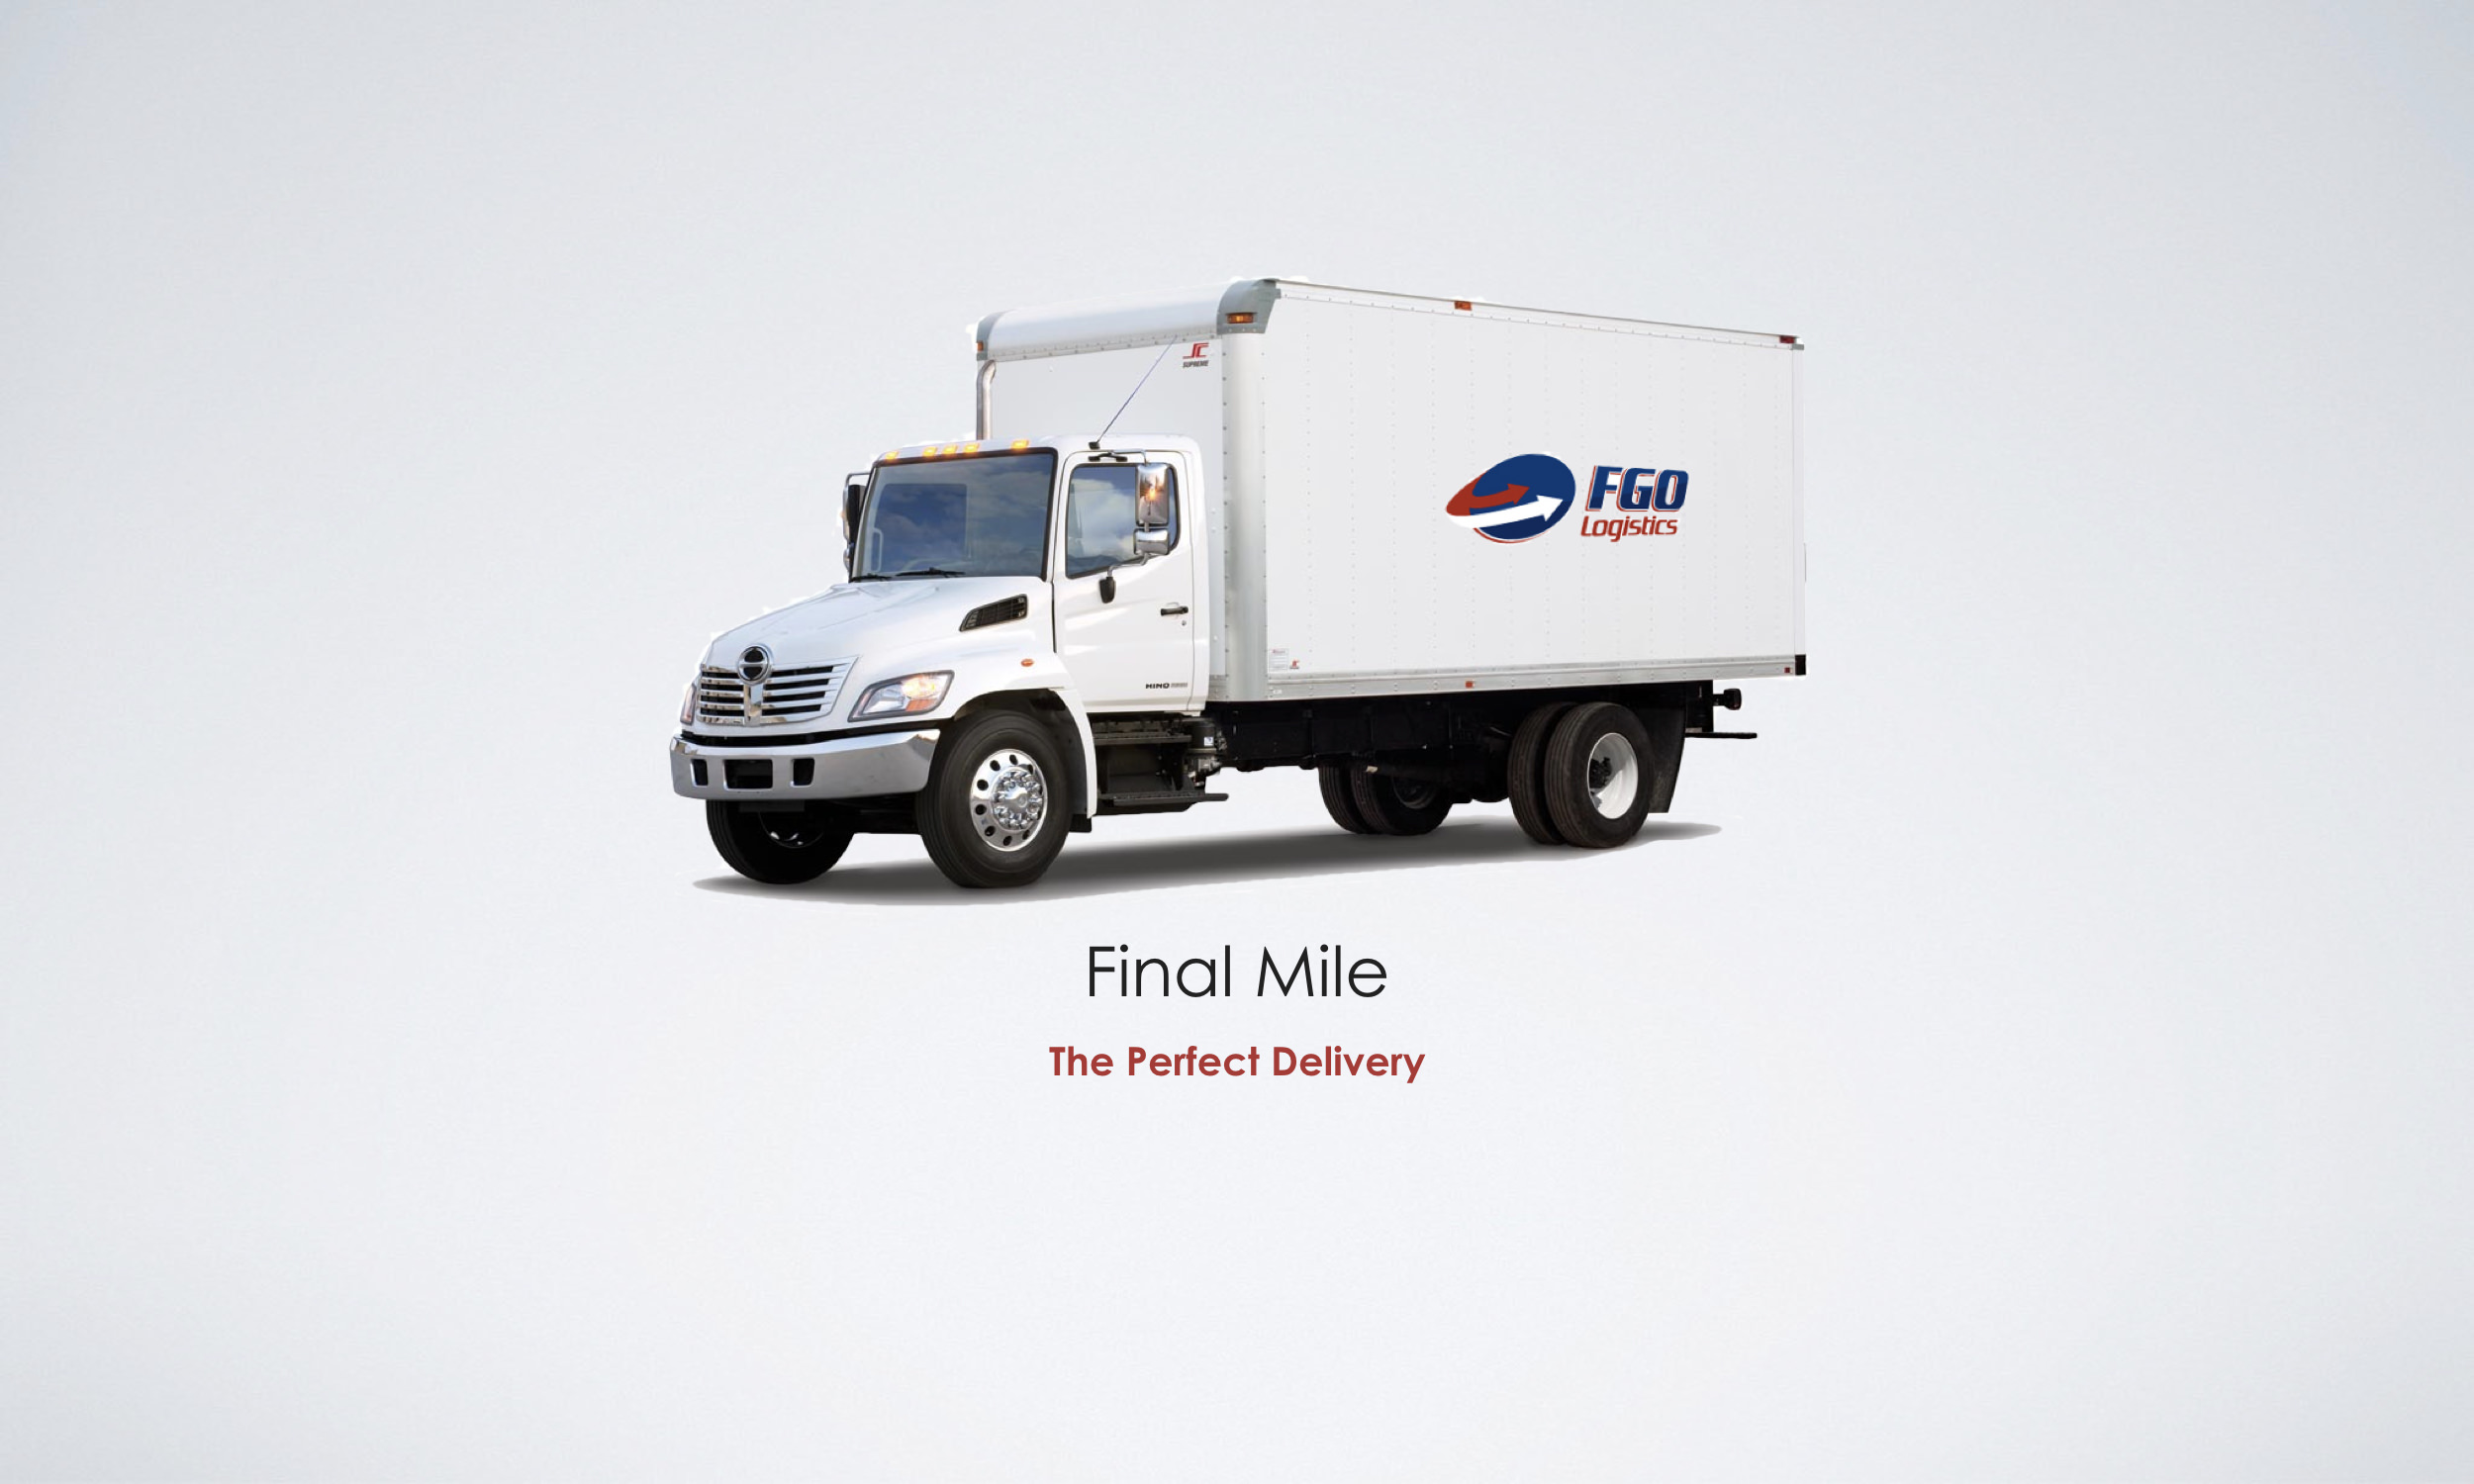 FGO Logistics Slideshow.004.jpeg